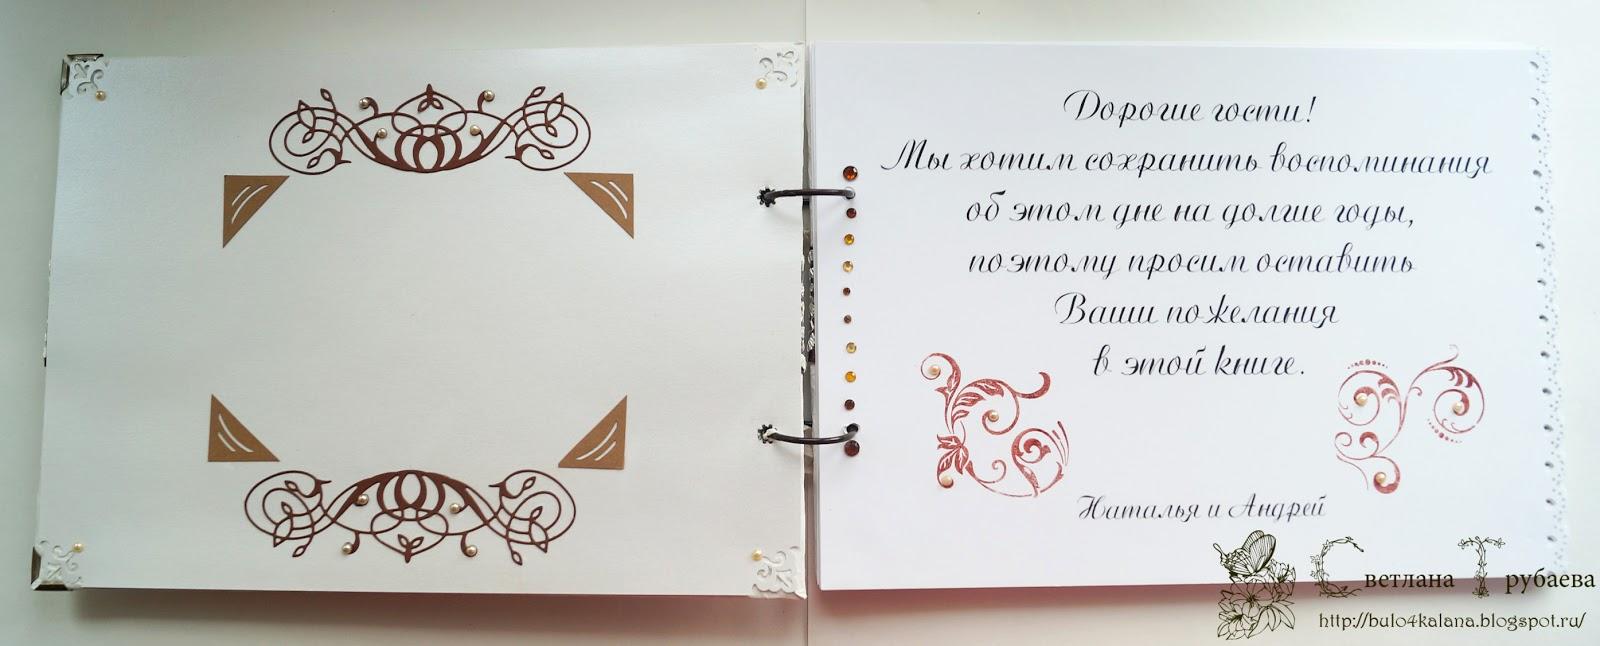 Книга с пожеланиями на свадьбу своими руками